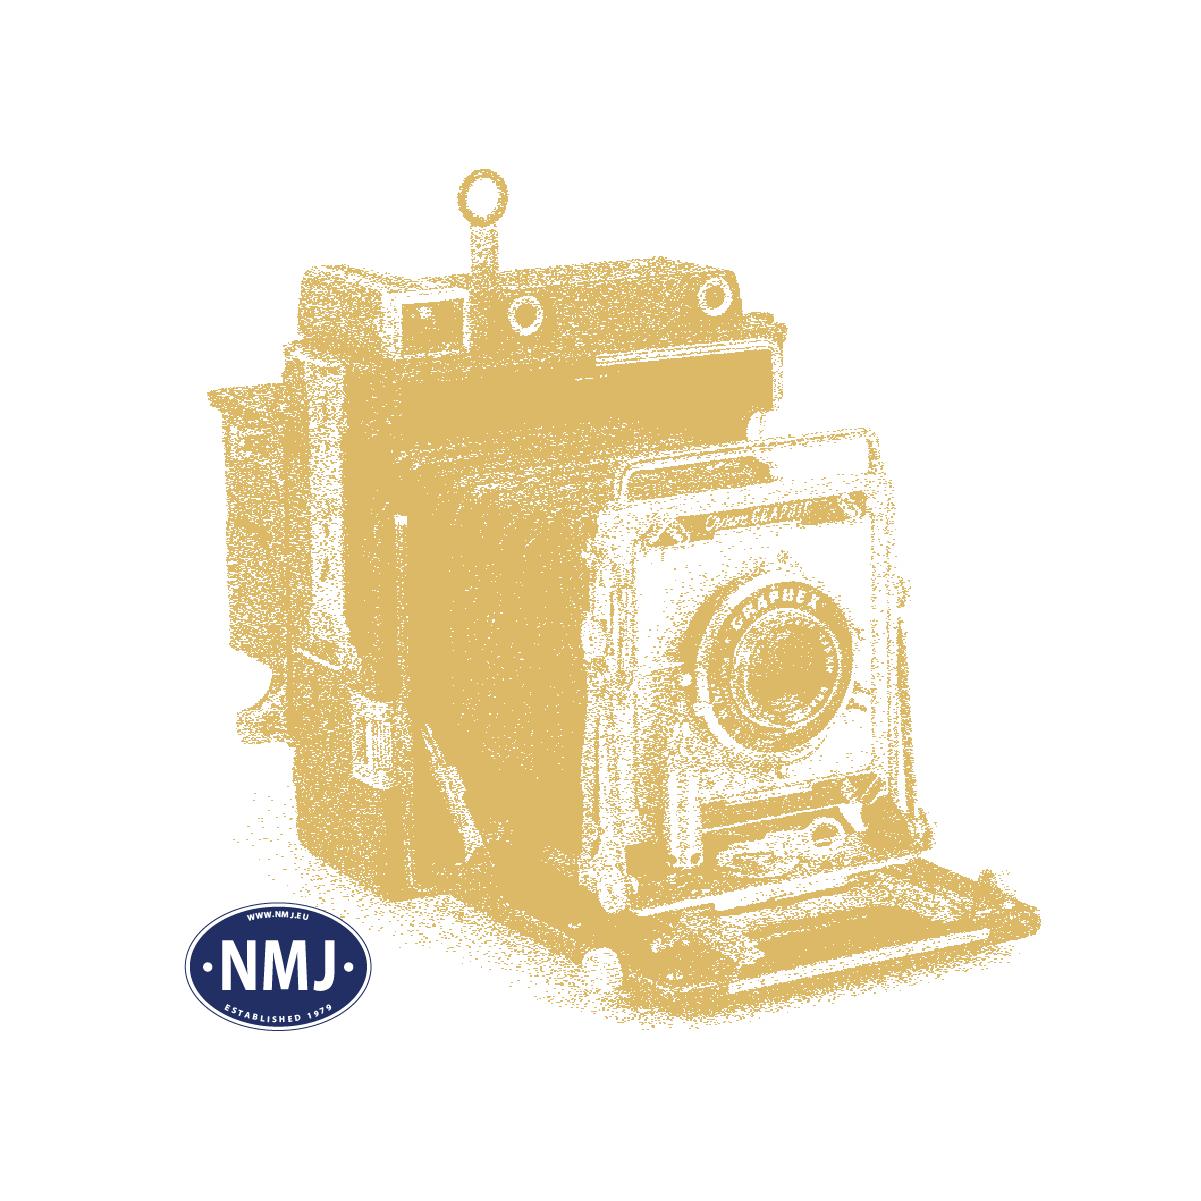 "NMJT132.305 - NMJ Topline NSB CB3 21235 ""Barnetoget"", Nydesign"